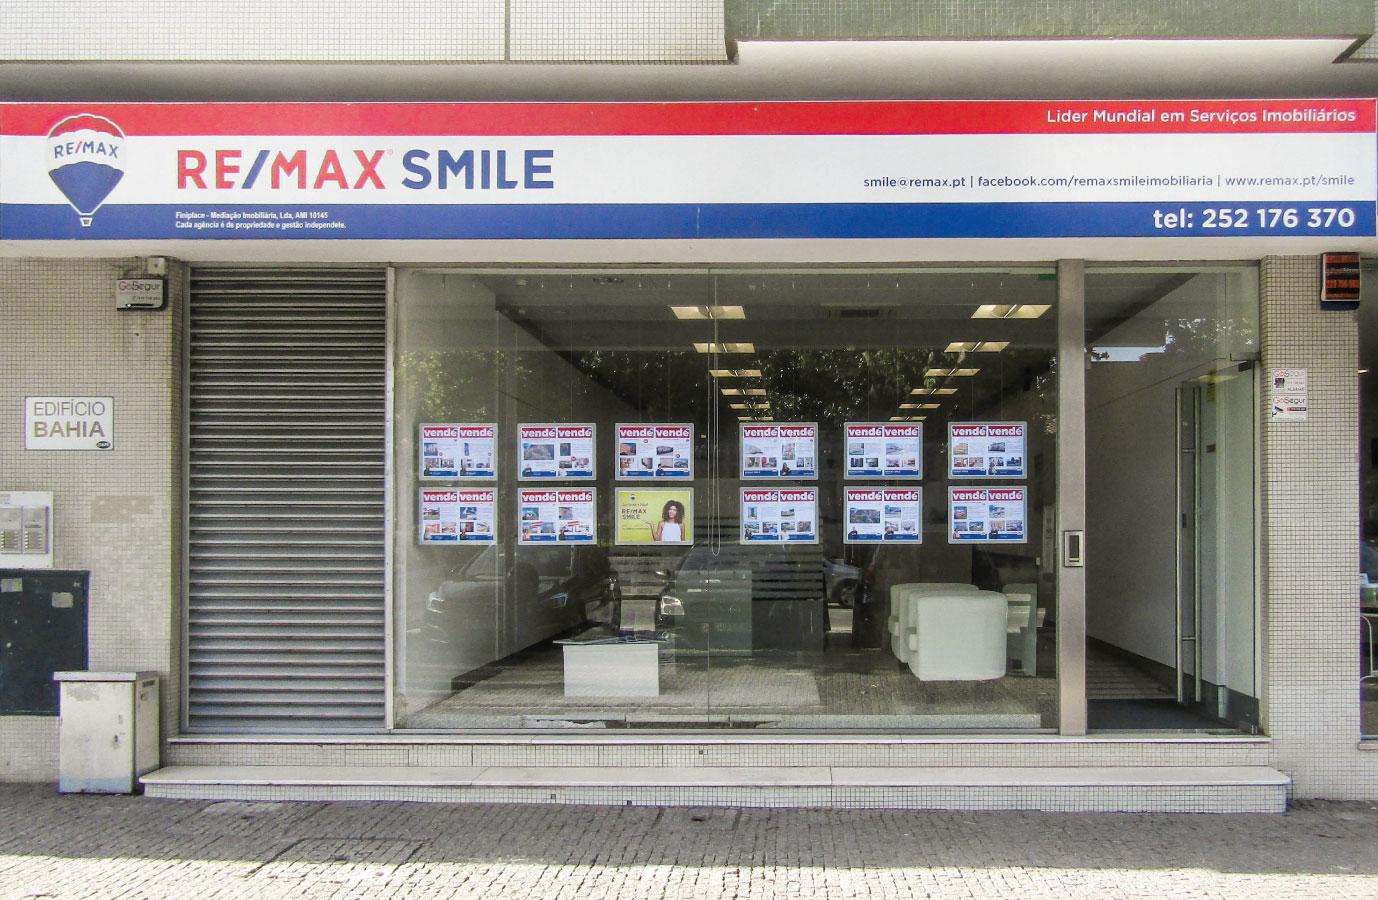 Loja Agência Imobiliária Remax Smile - Trofa